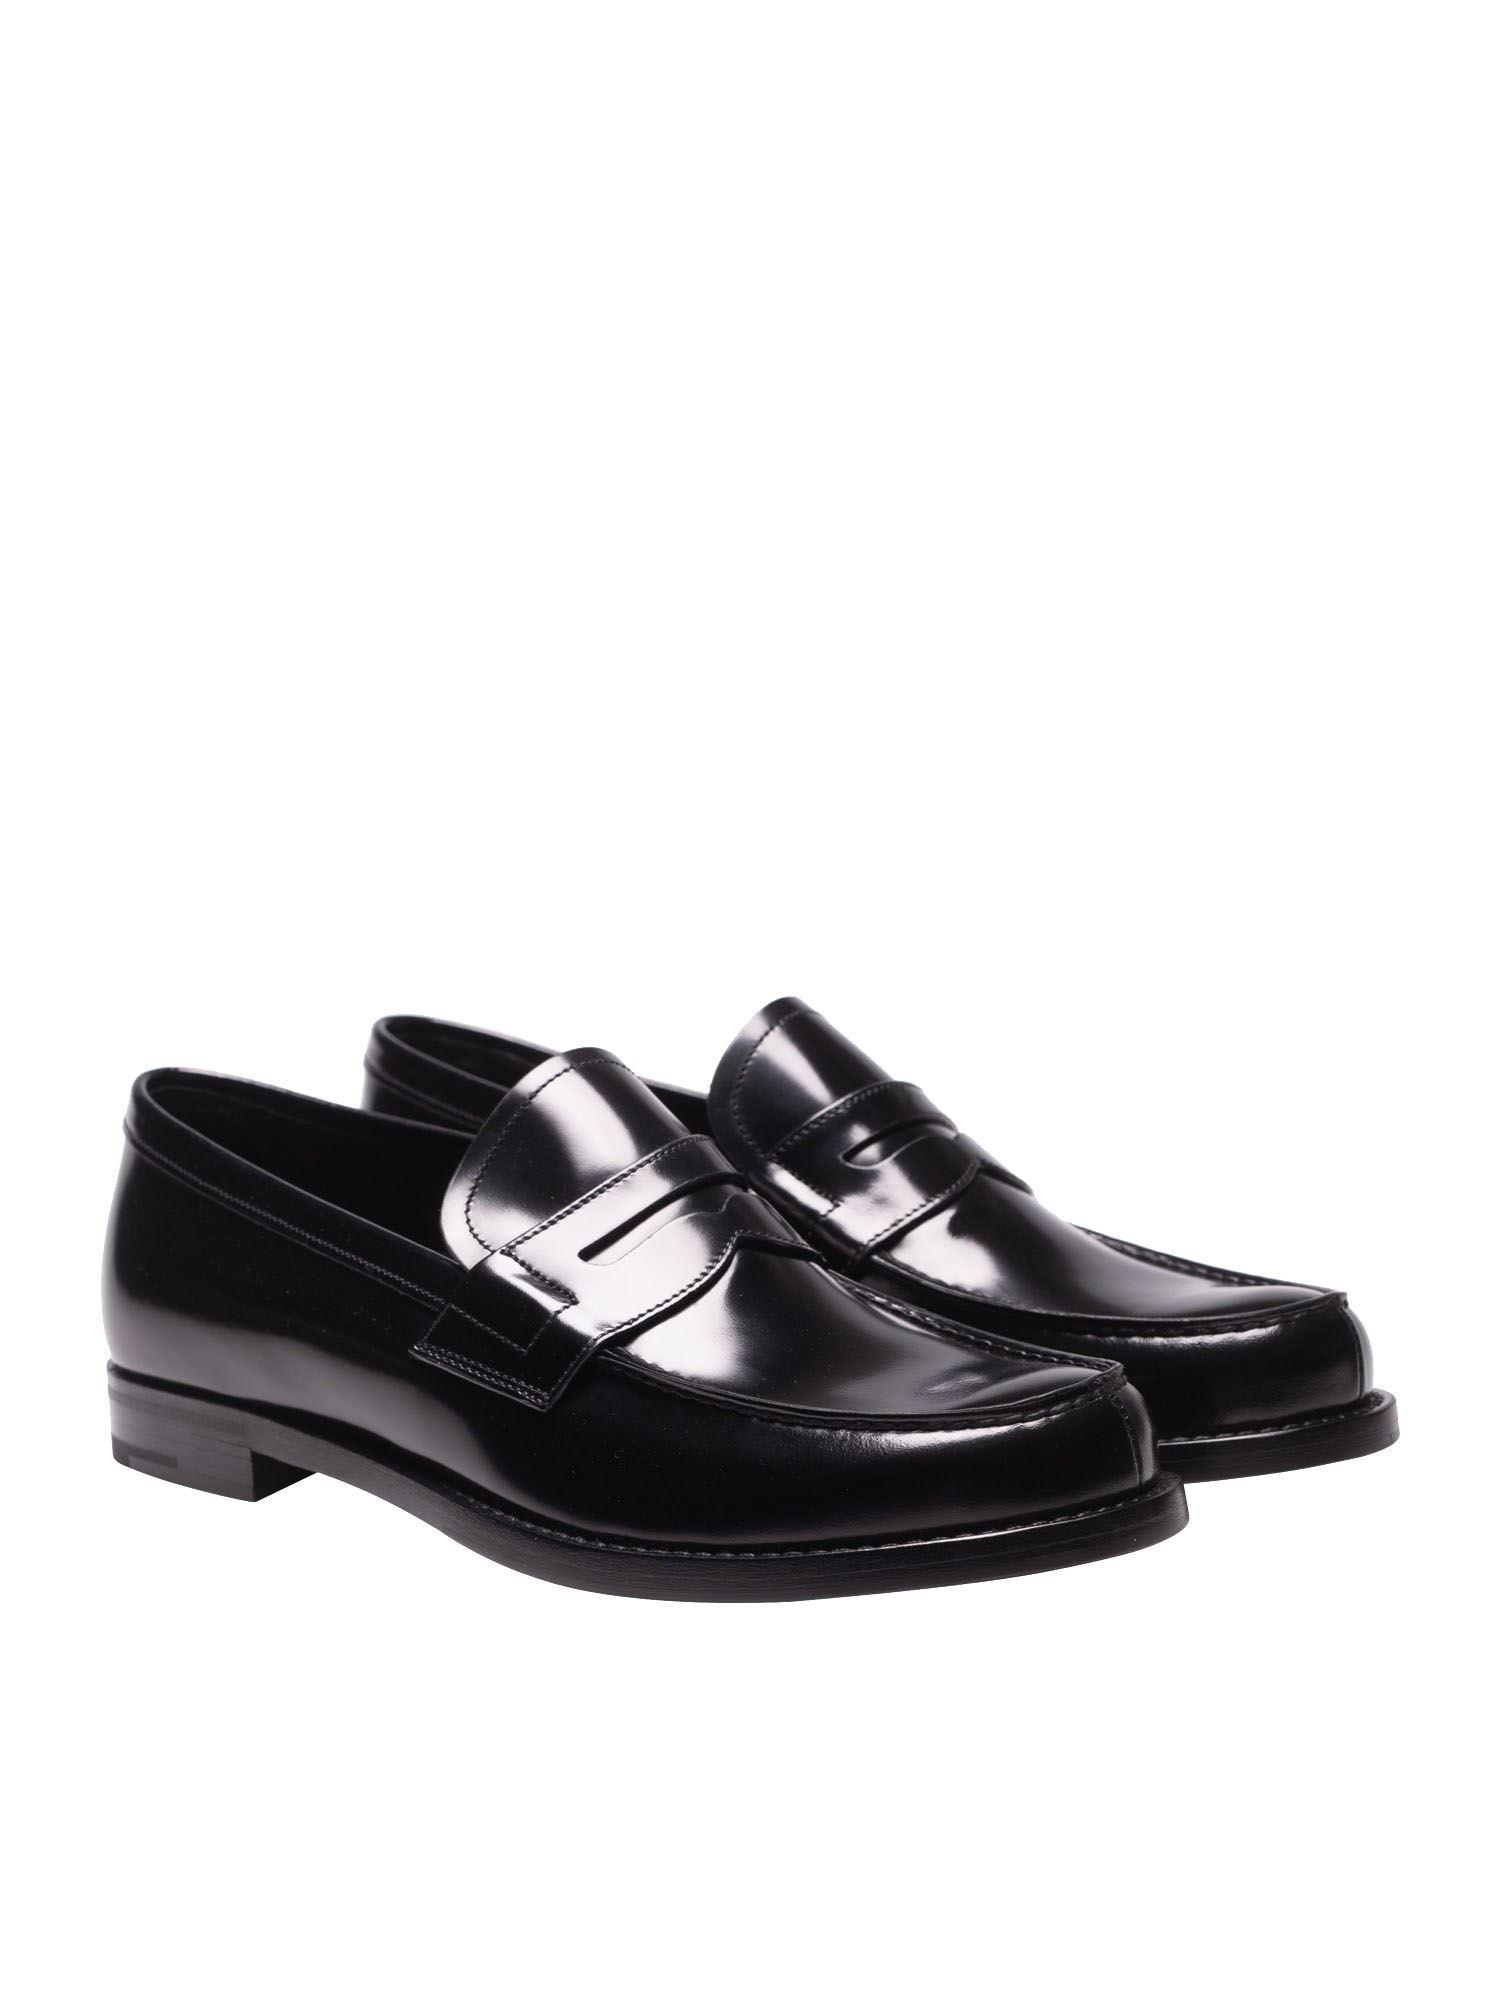 56db759970d Lyst - Prada Black Brushed Leather Loafers in Black for Men - Save 4%